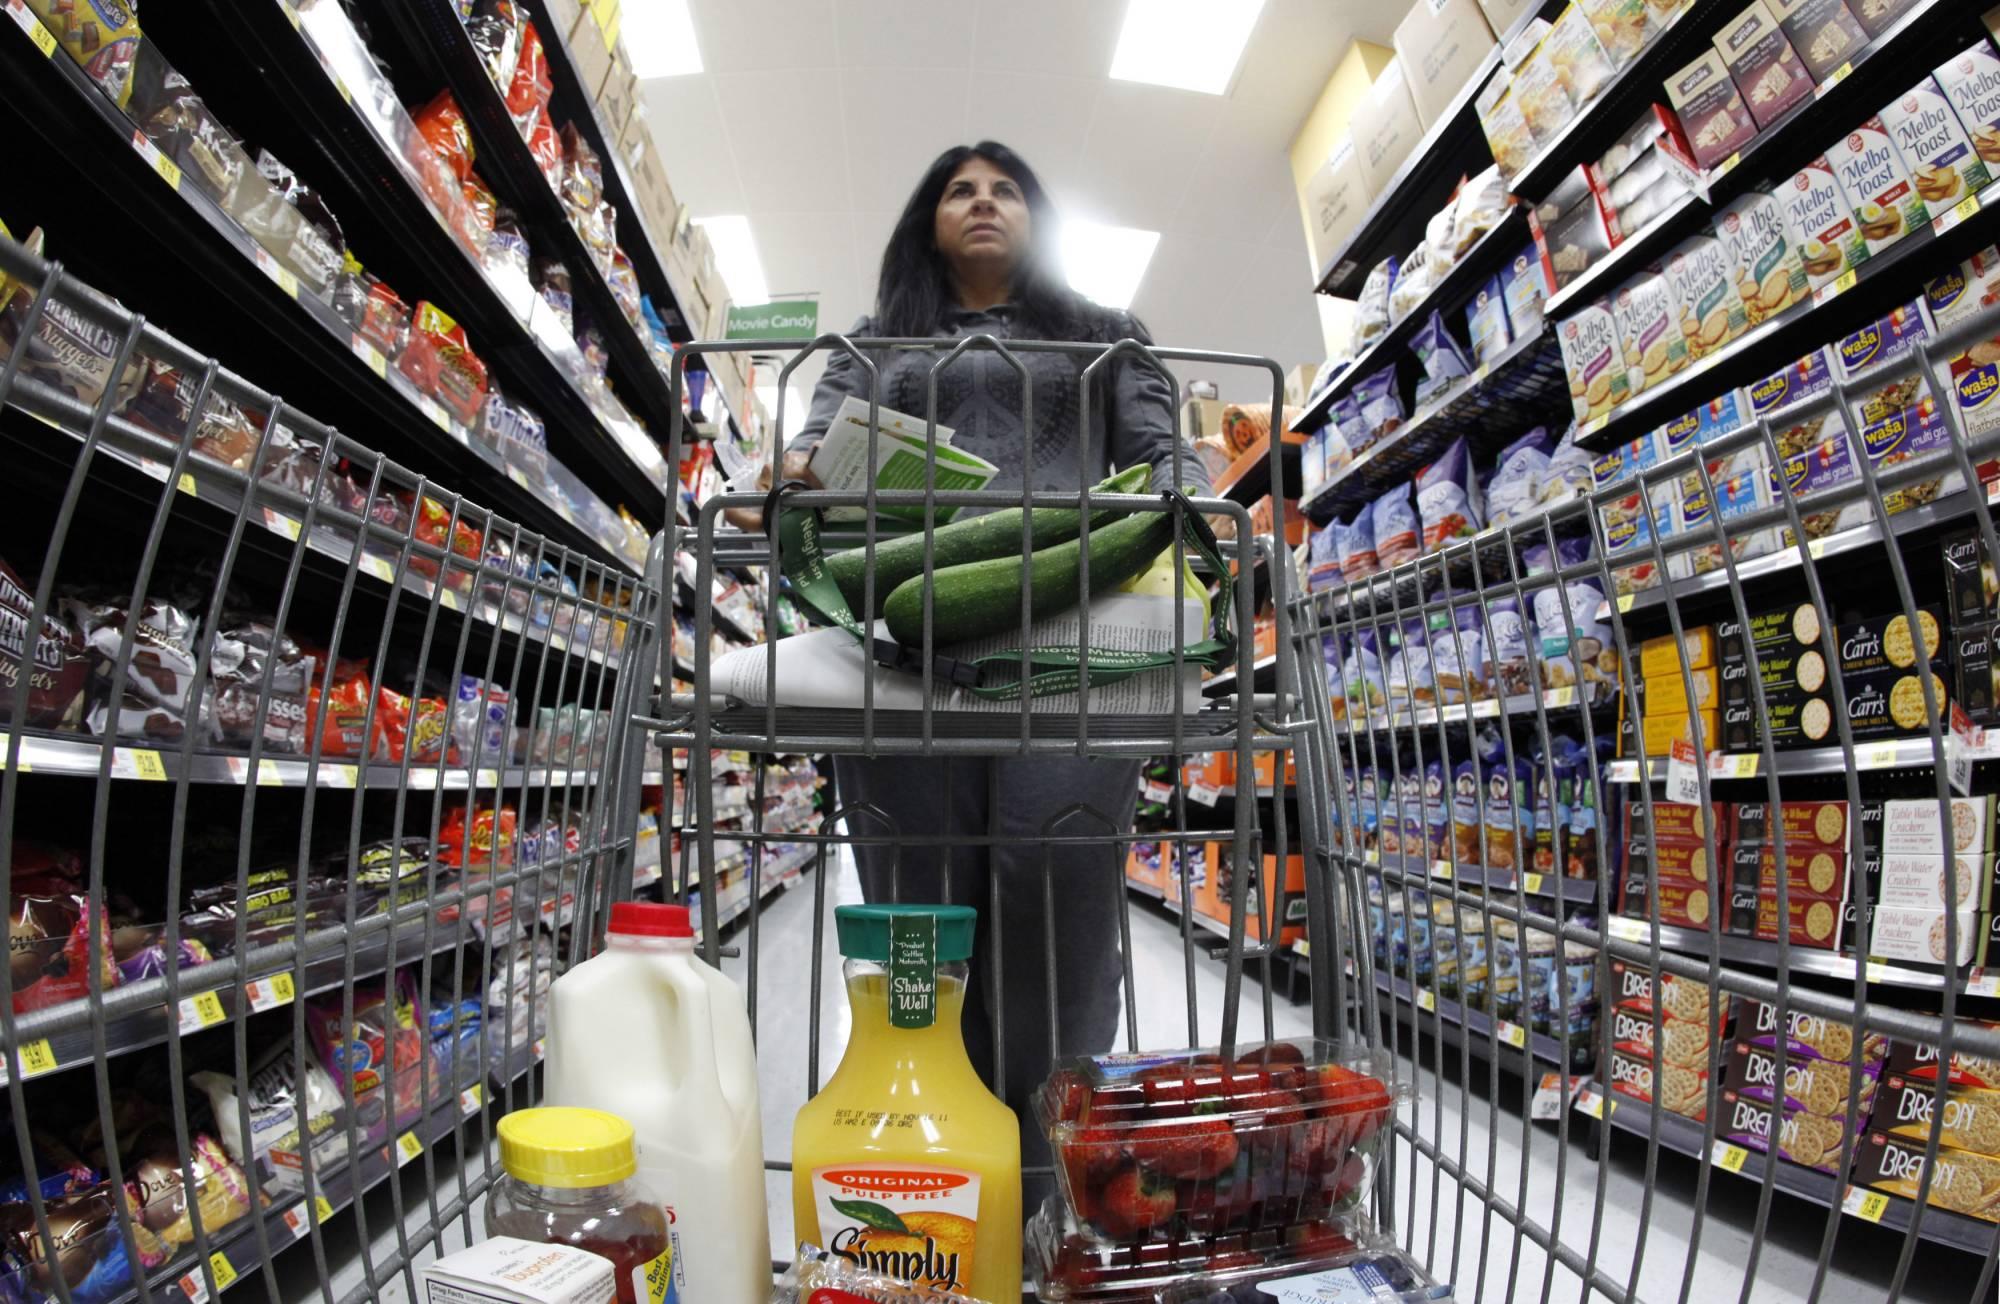 A shopper walks down an aisle in a newly opened Walmart Neighborhood Market in Chicago